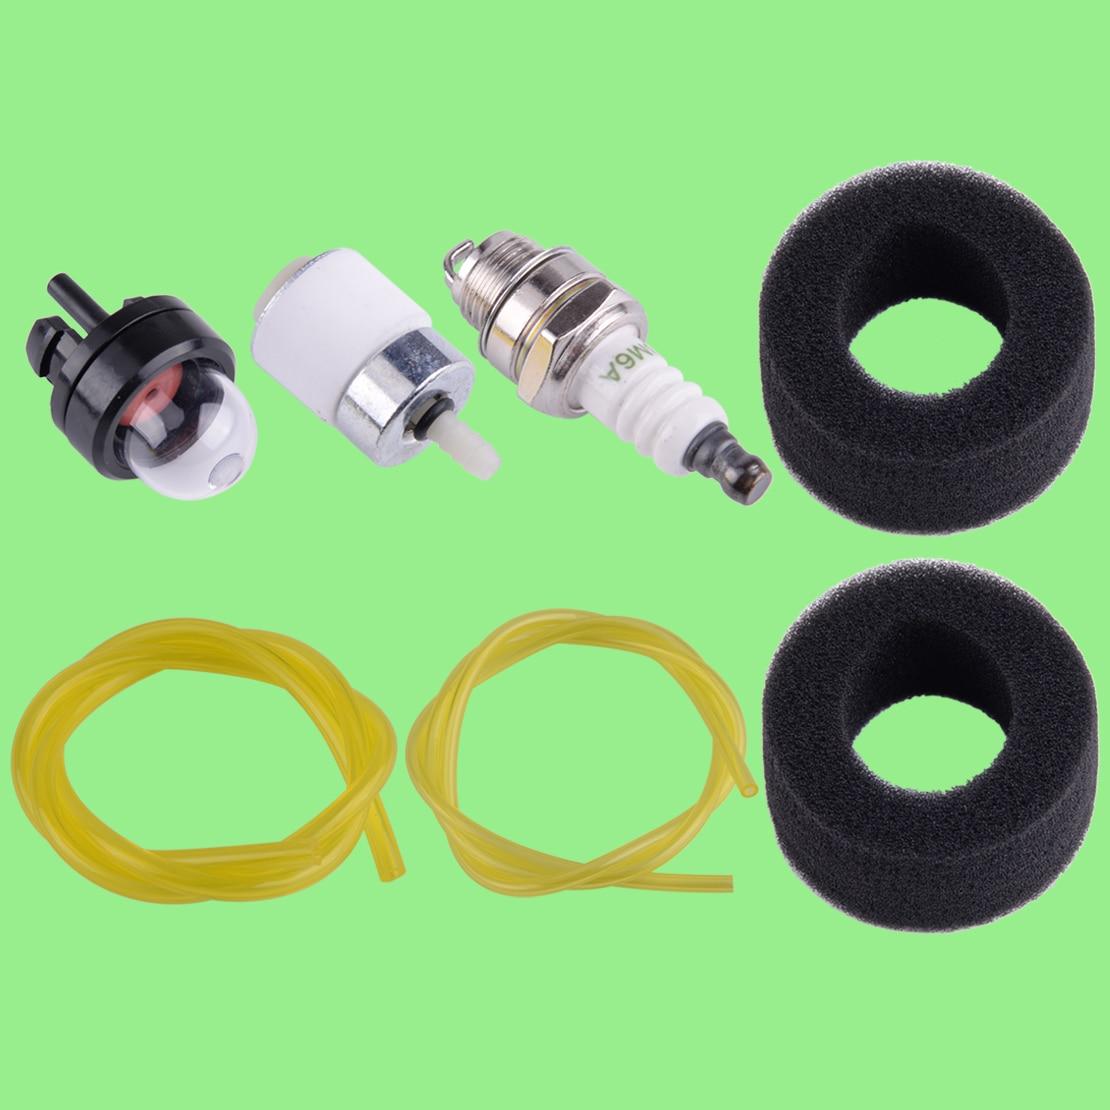 Air Filter Fuel Line Kit For Toro 58355 58356 Tiller 51906 51907 51908 51909 US